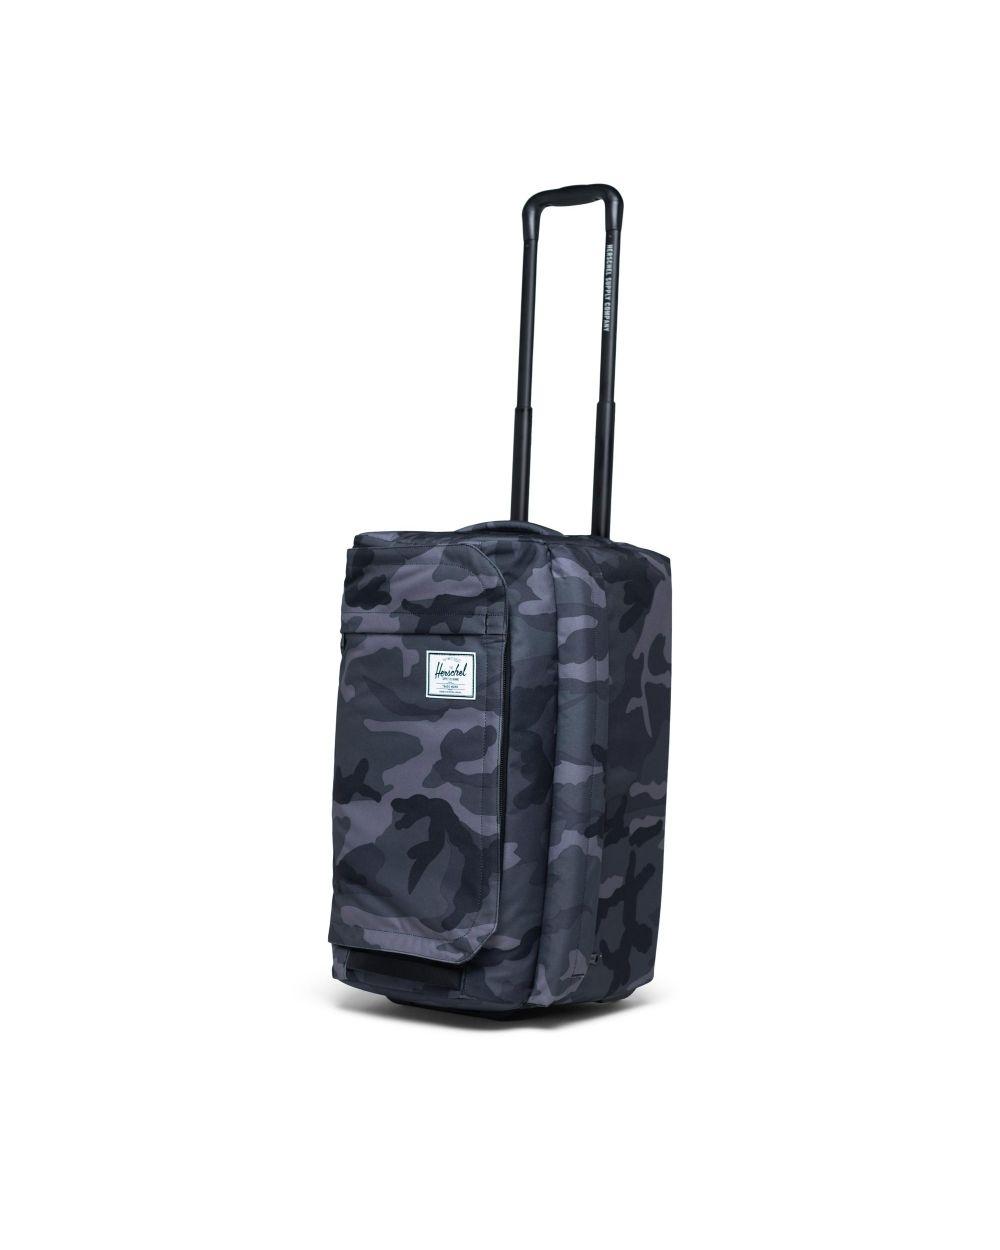 OUtlander wheelie suitcase in blue/grey print